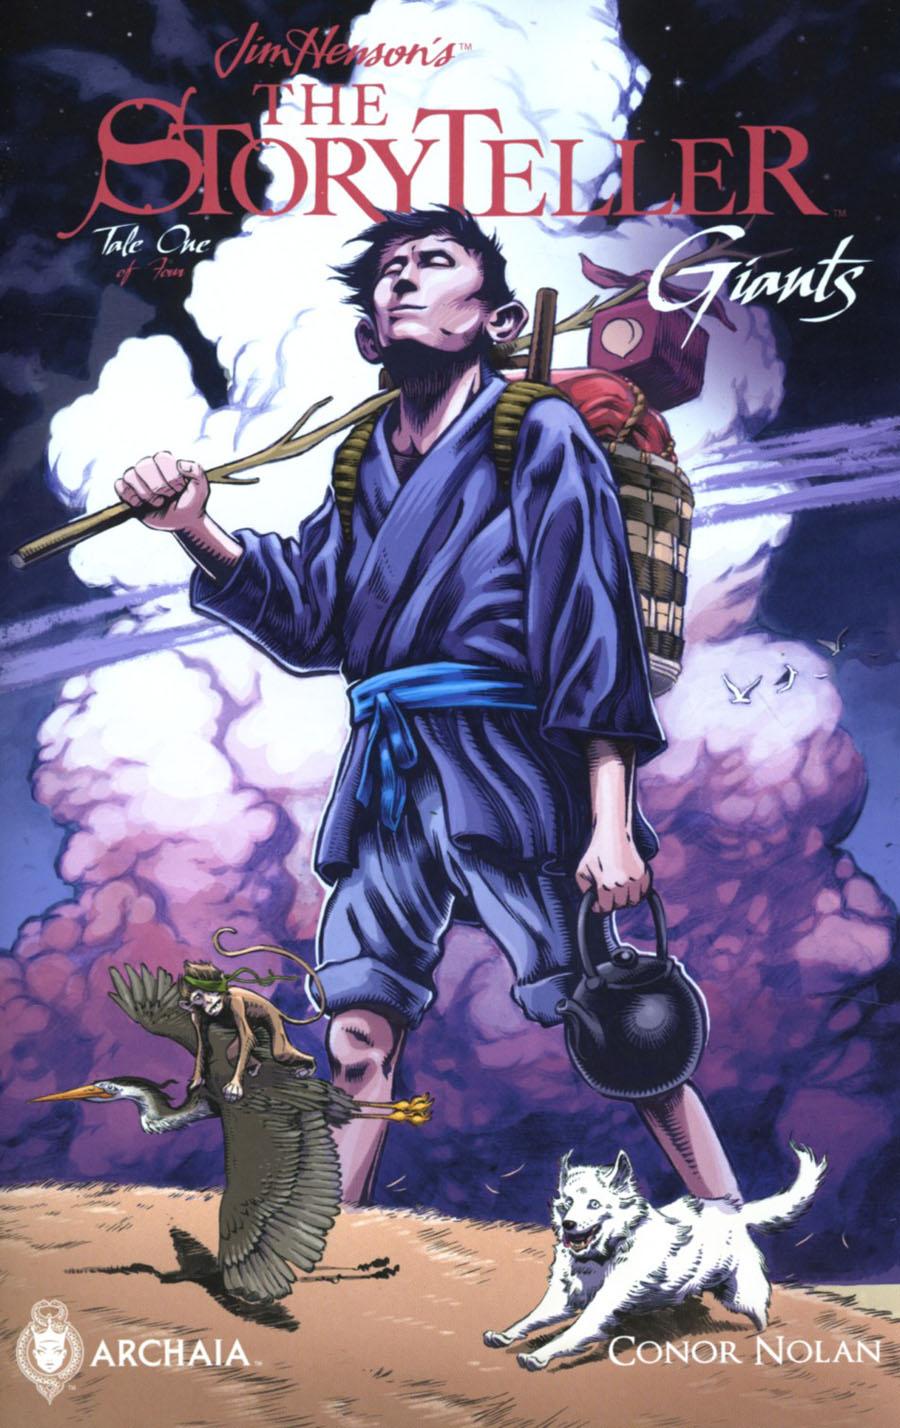 Jim Hensons Storyteller Giants #1 Cover A Regular Conor Nolan Cover